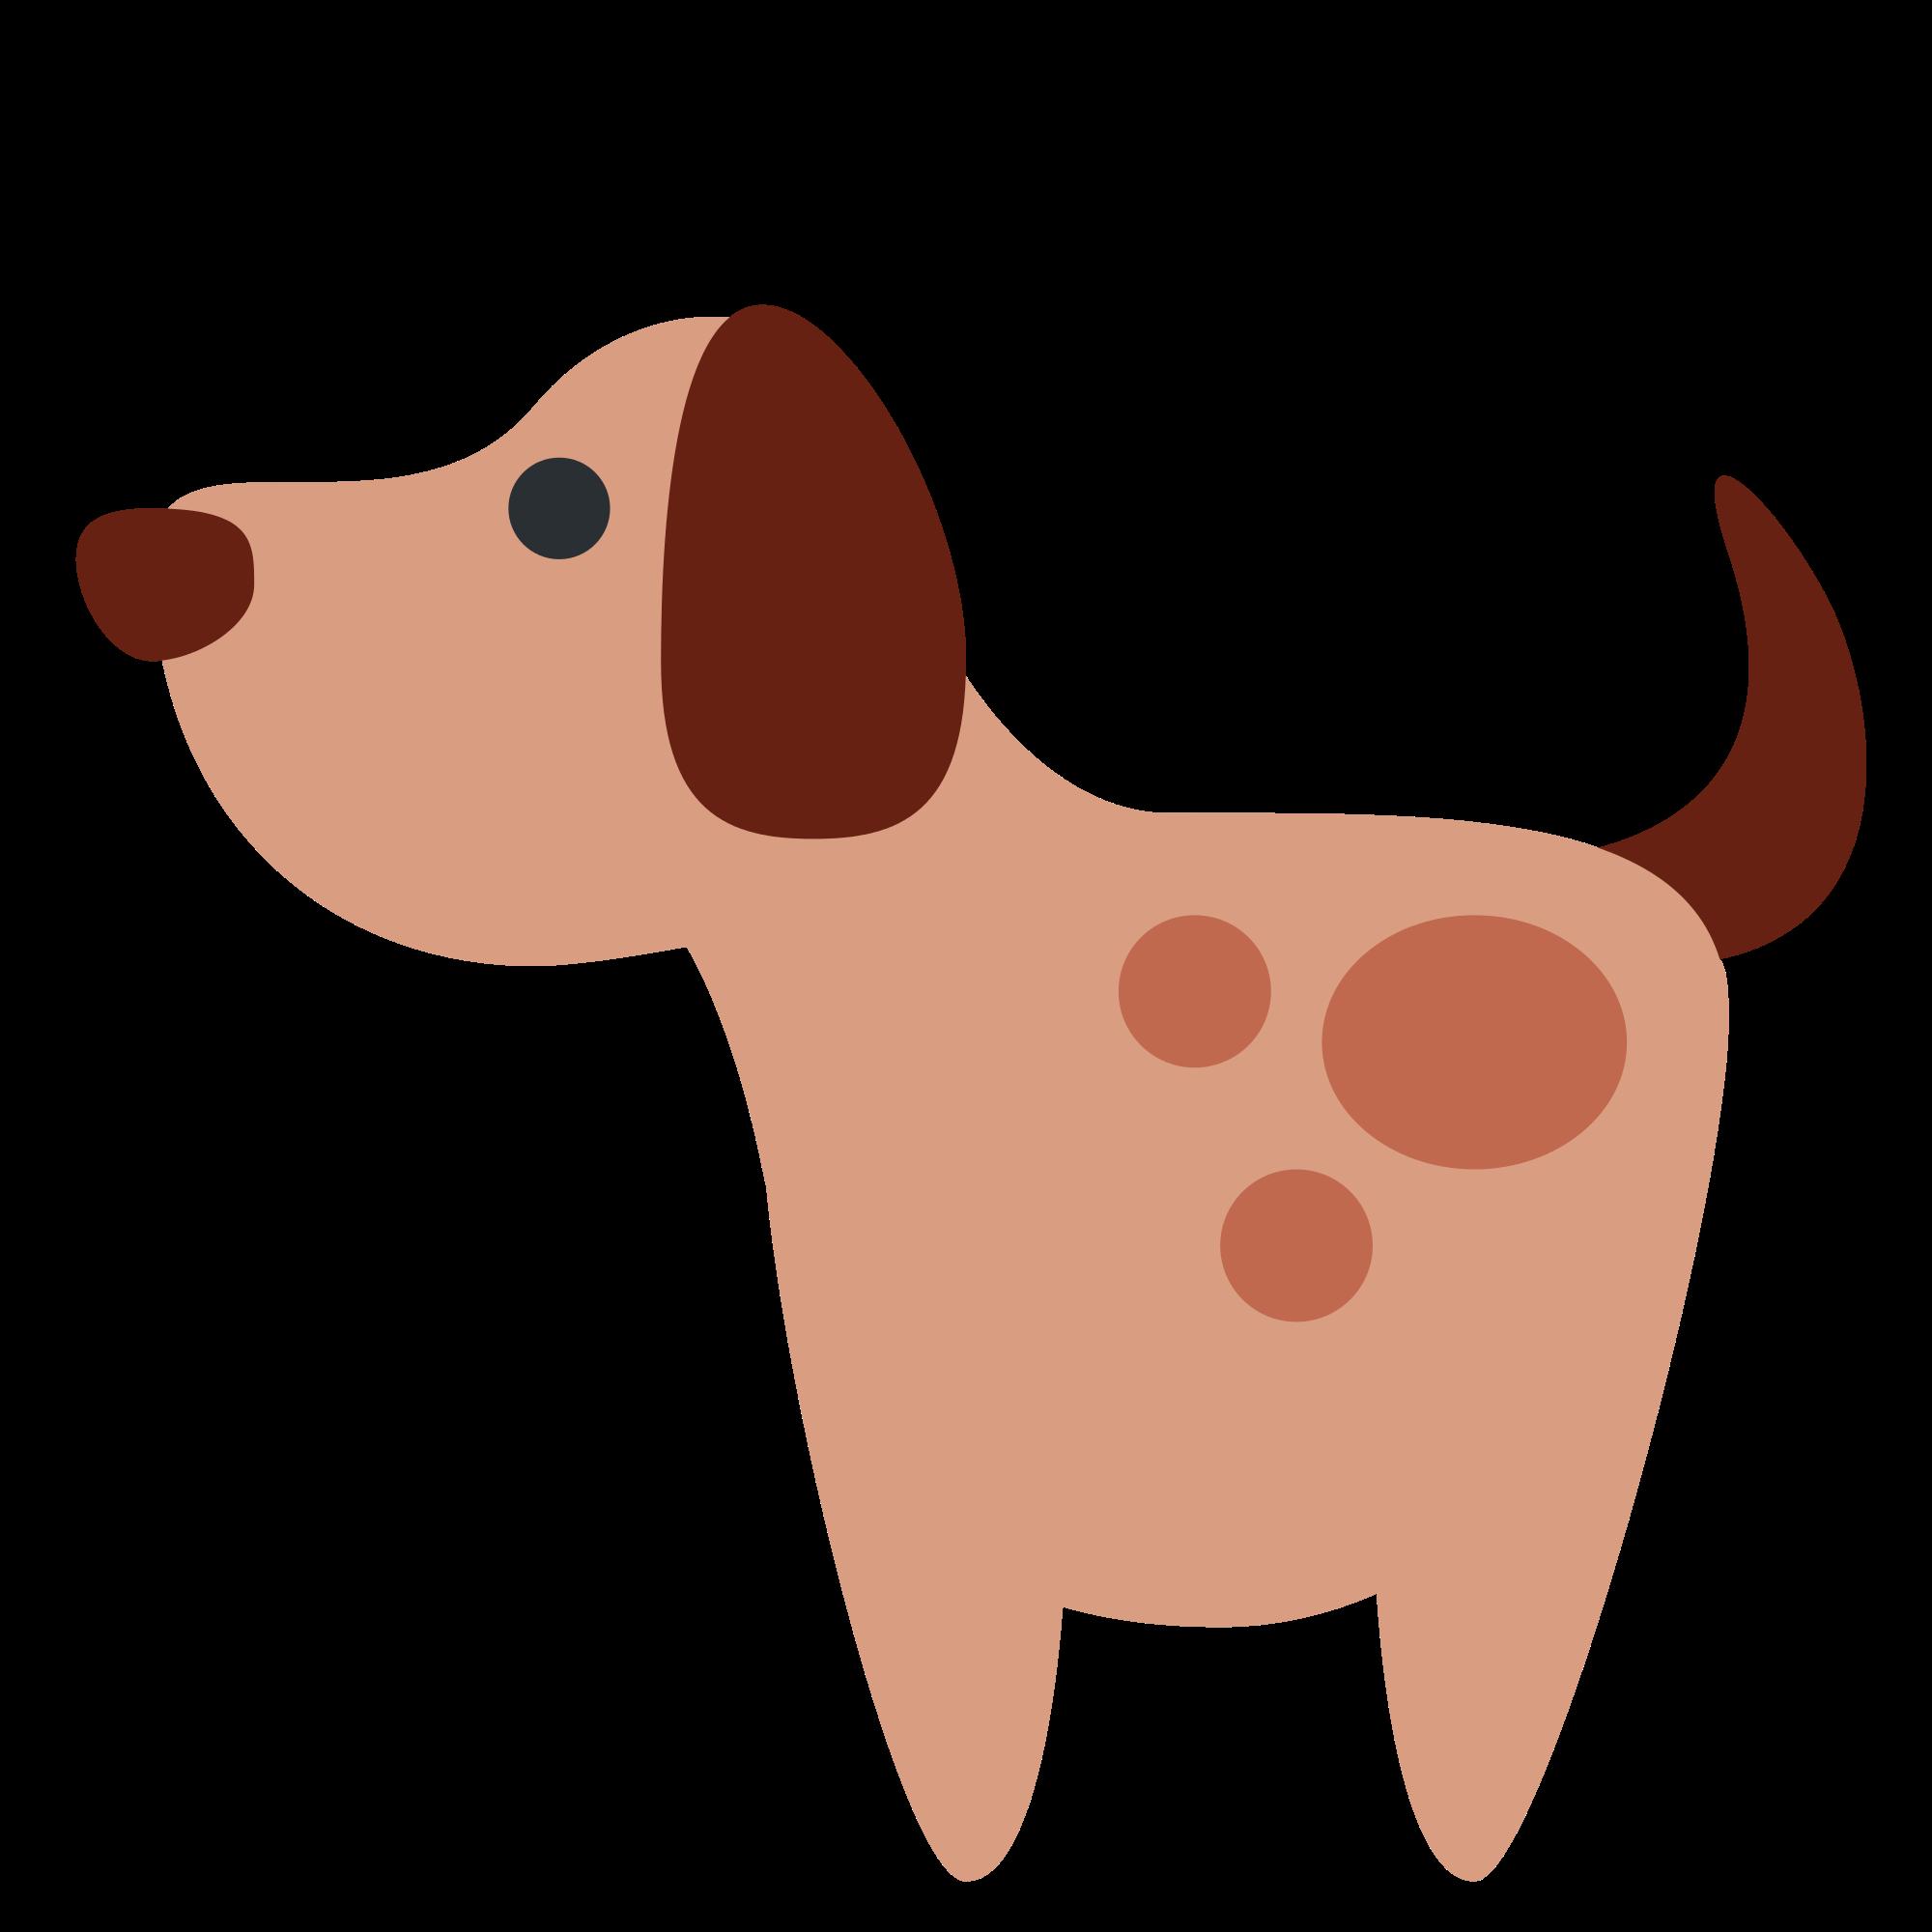 Clipart puppy svg. File twemoji f wikimedia